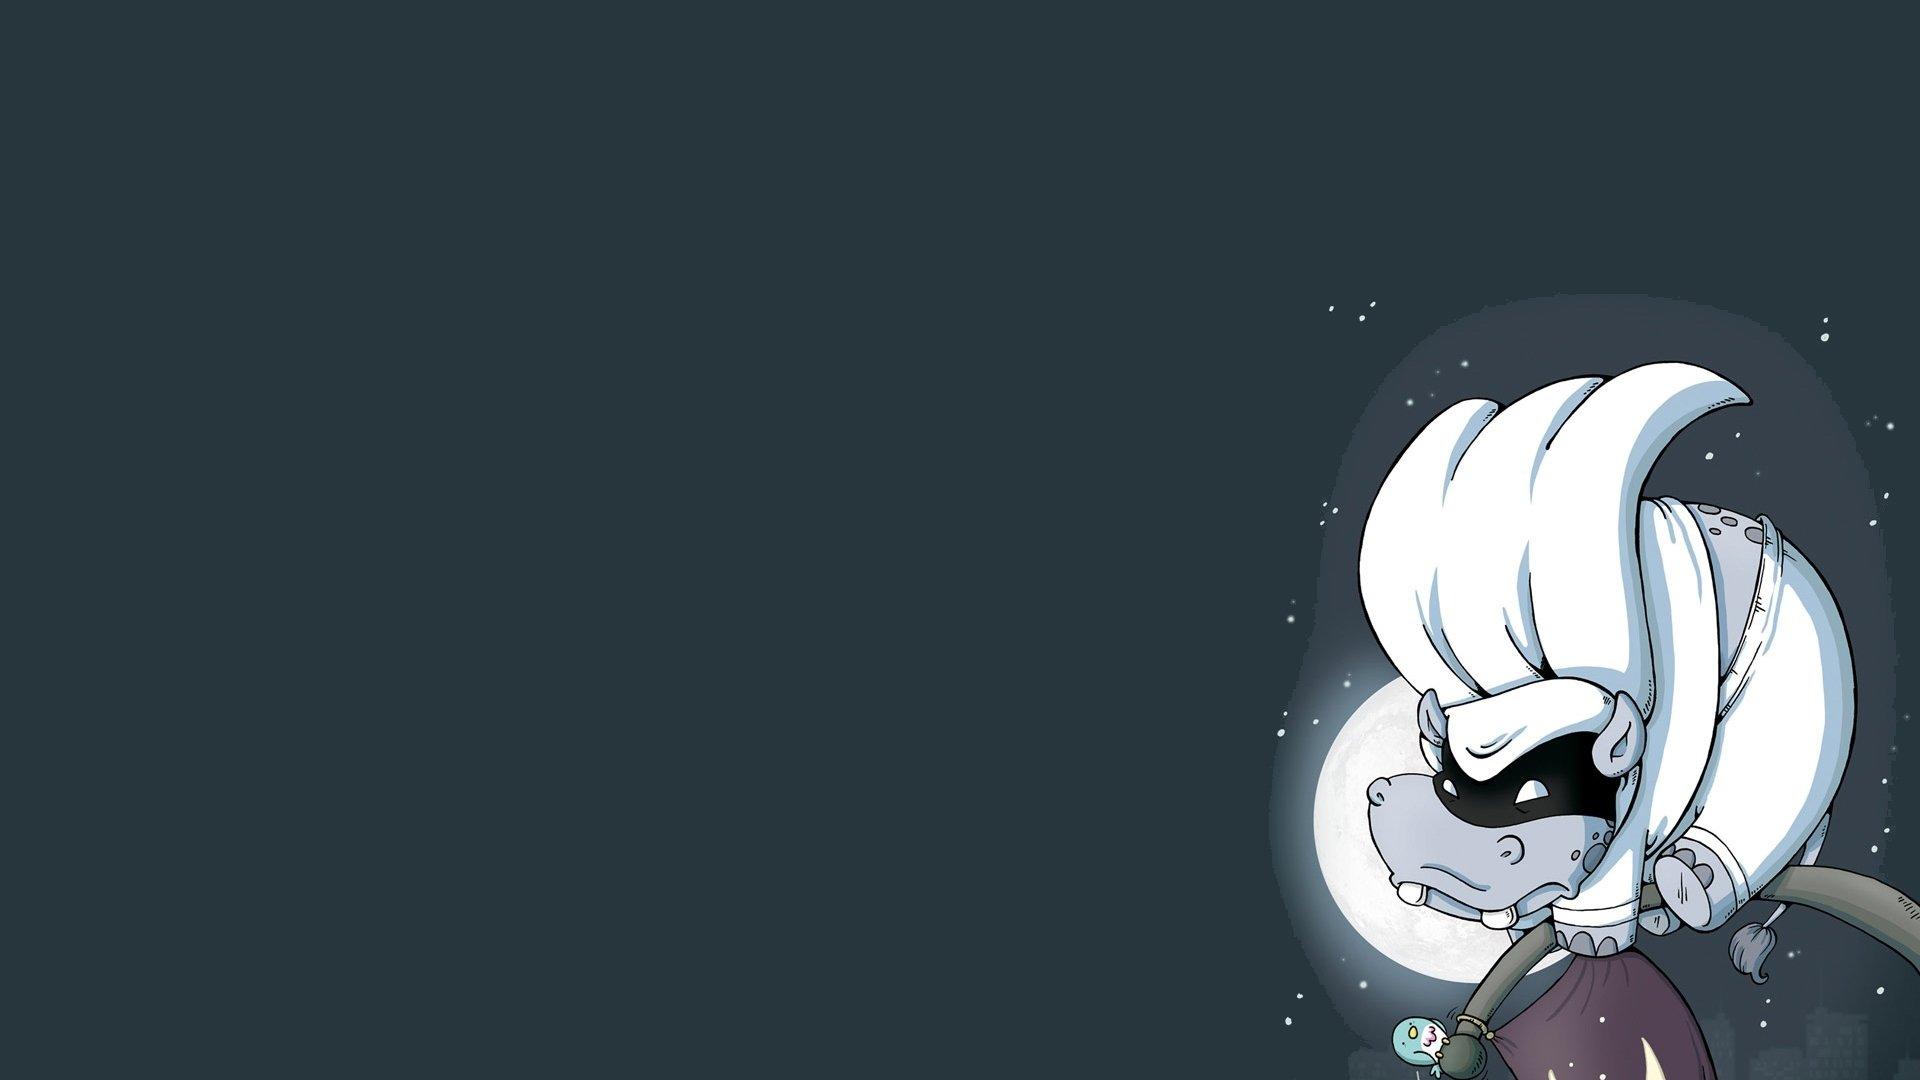 moon knight computer wallpapers desktop backgrounds